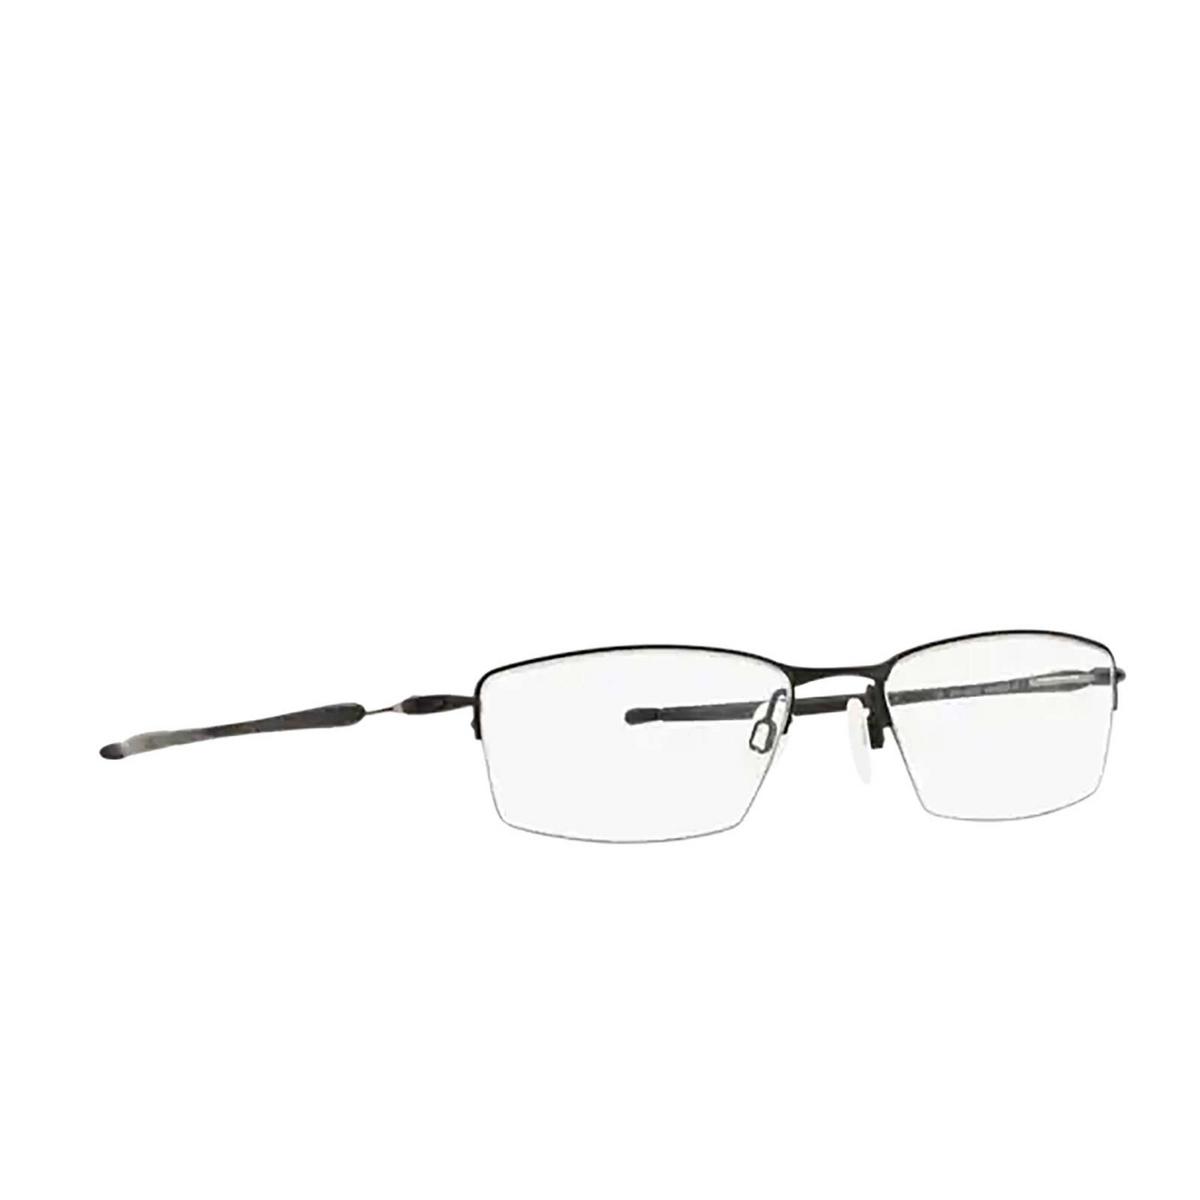 Oakley® Rectangle Eyeglasses: Lizard OX5113 color Satin Black 511301 - three-quarters view.